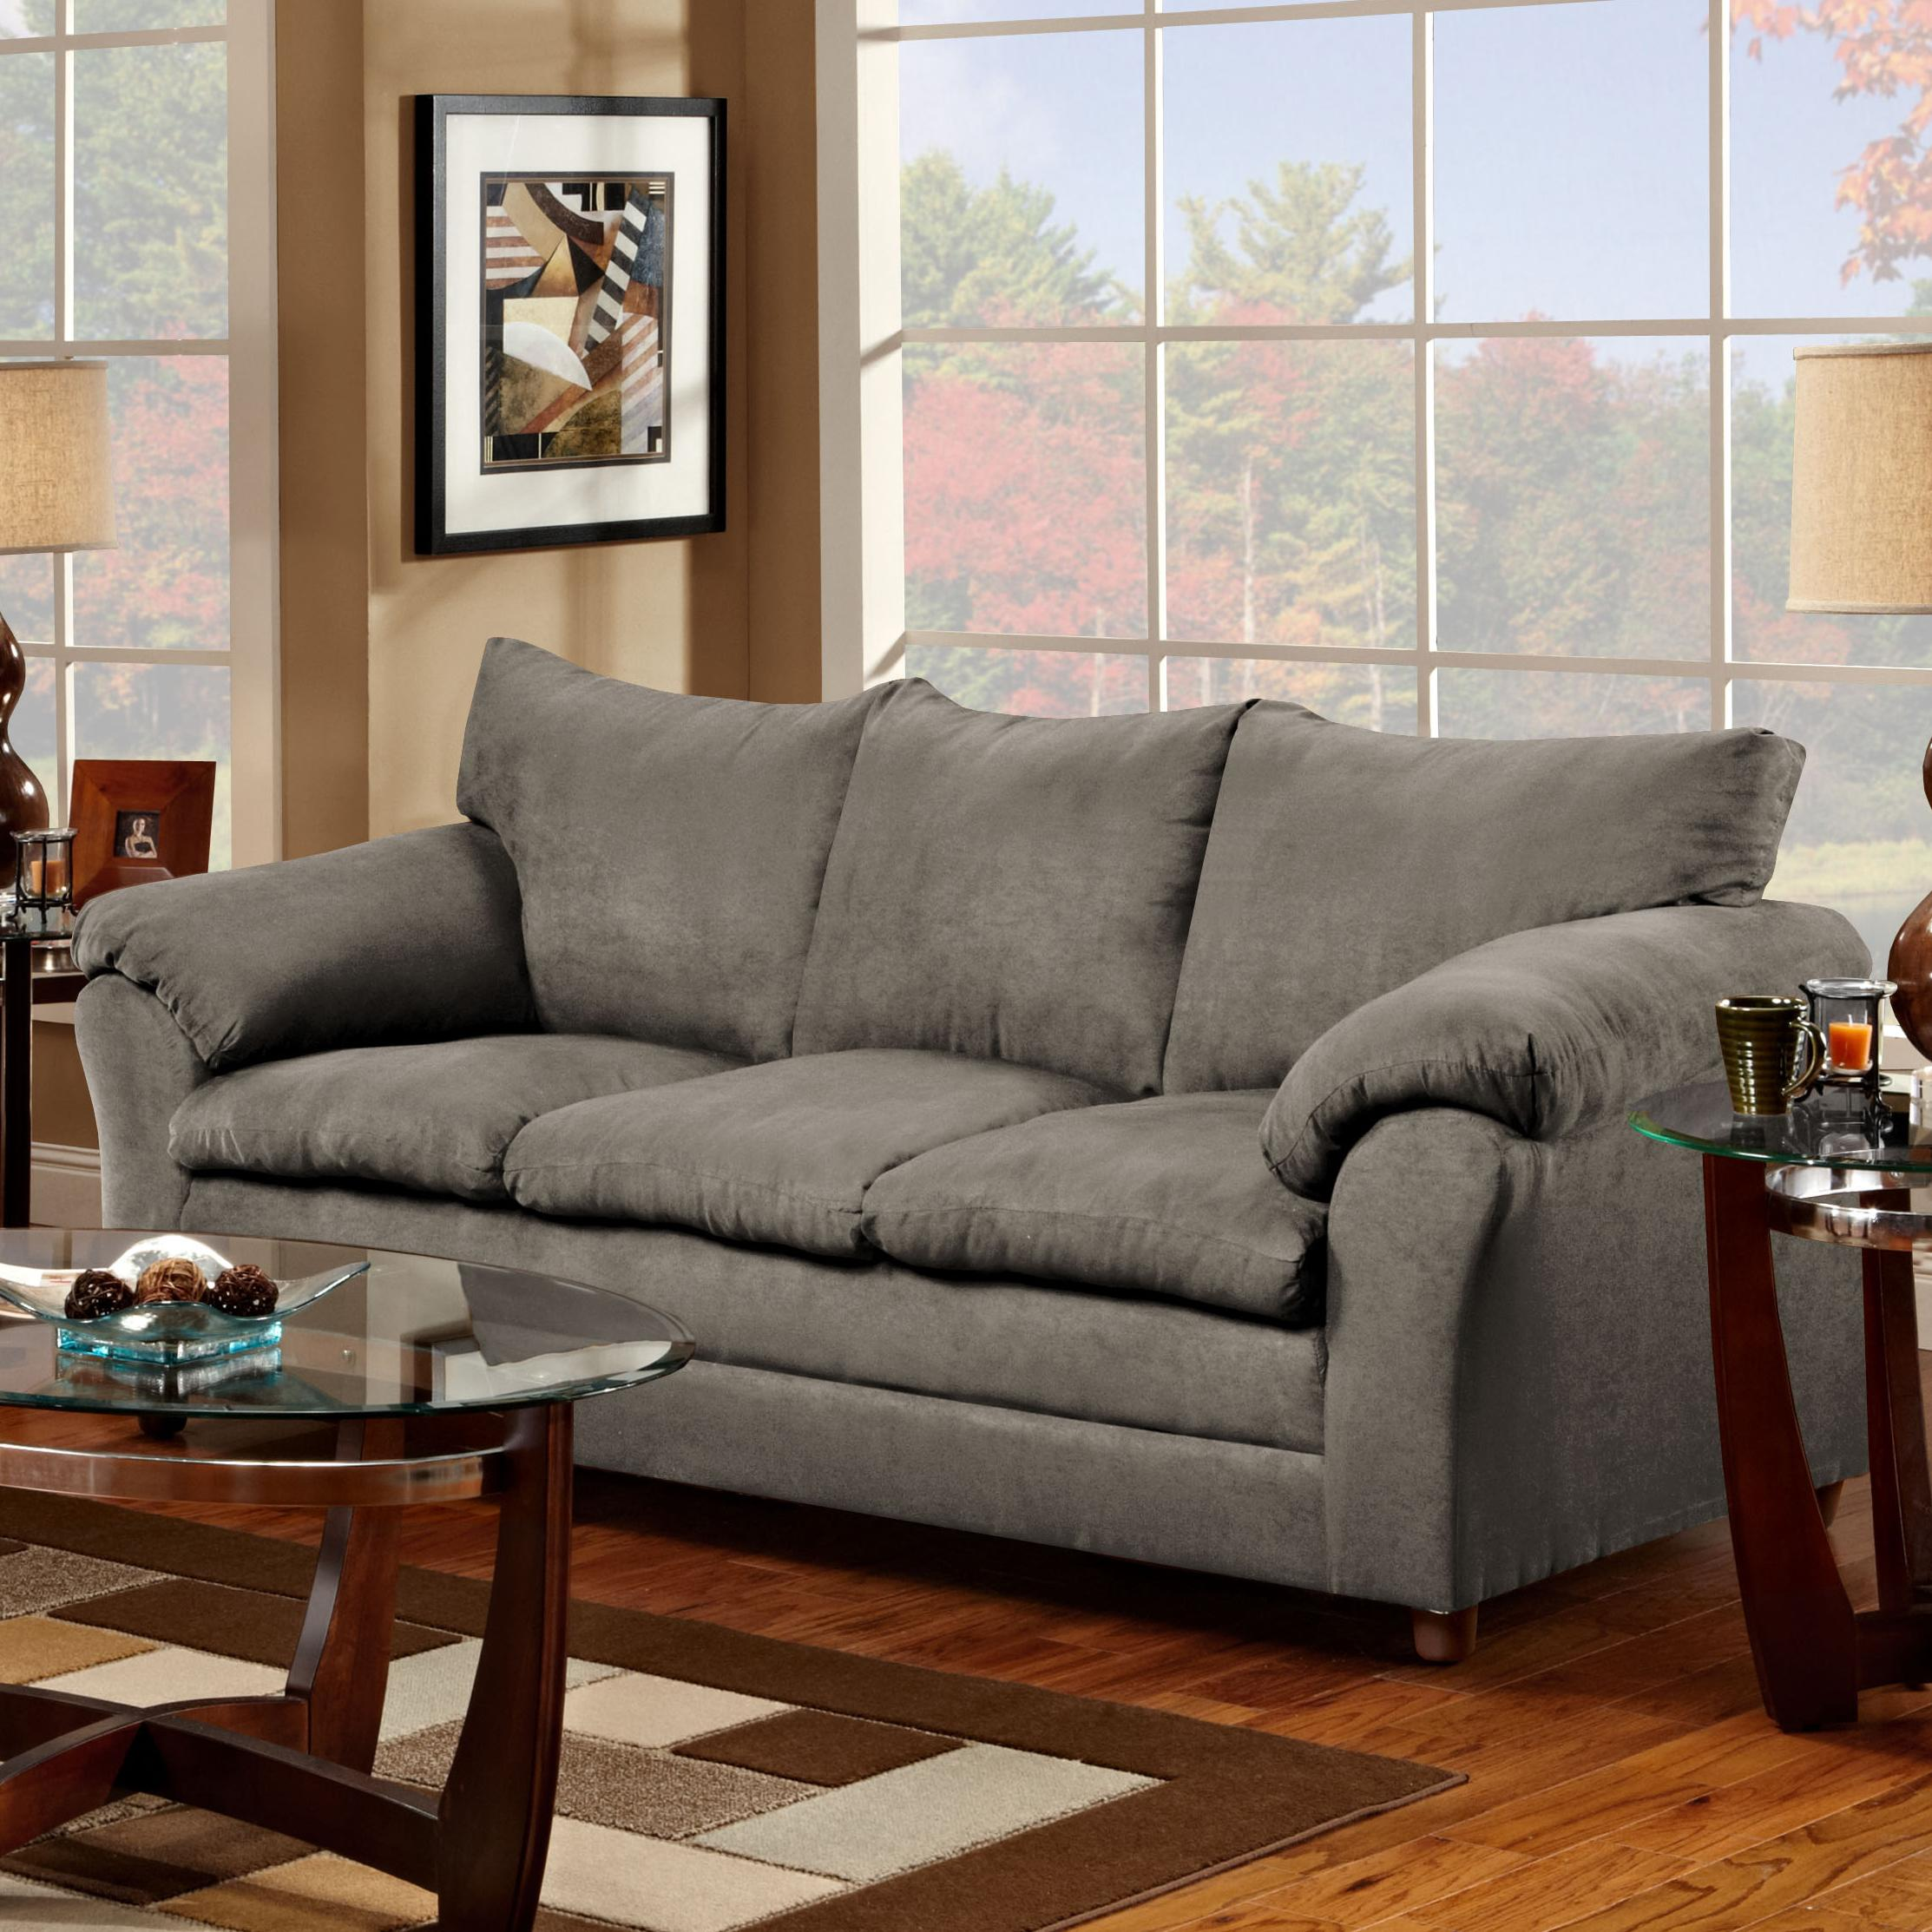 1150 Sofa by Washington Furniture at Lynn's Furniture & Mattress